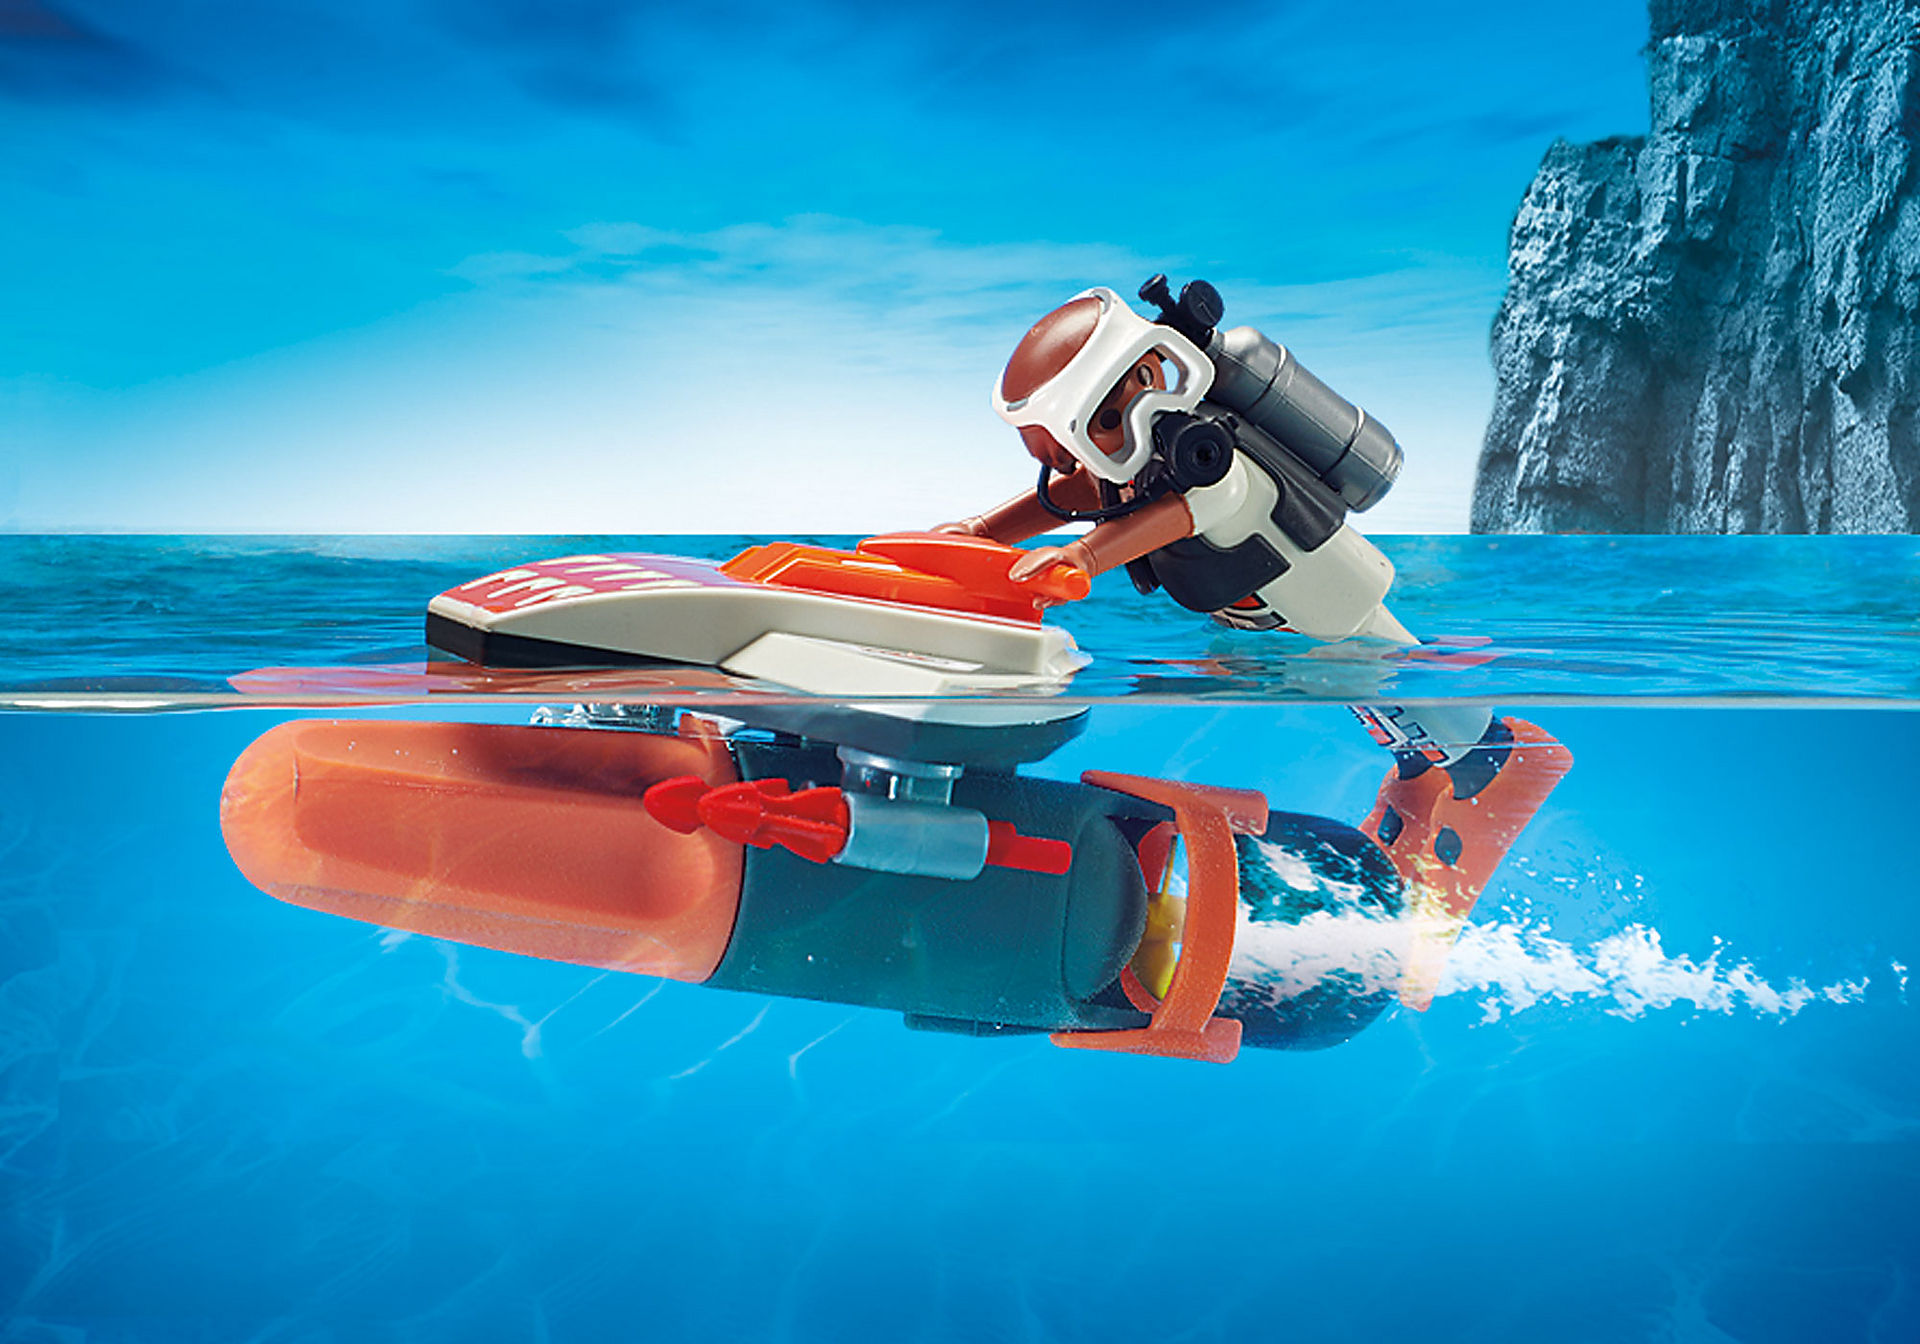 70004 Propulseur sous-marin Spy Team zoom image5